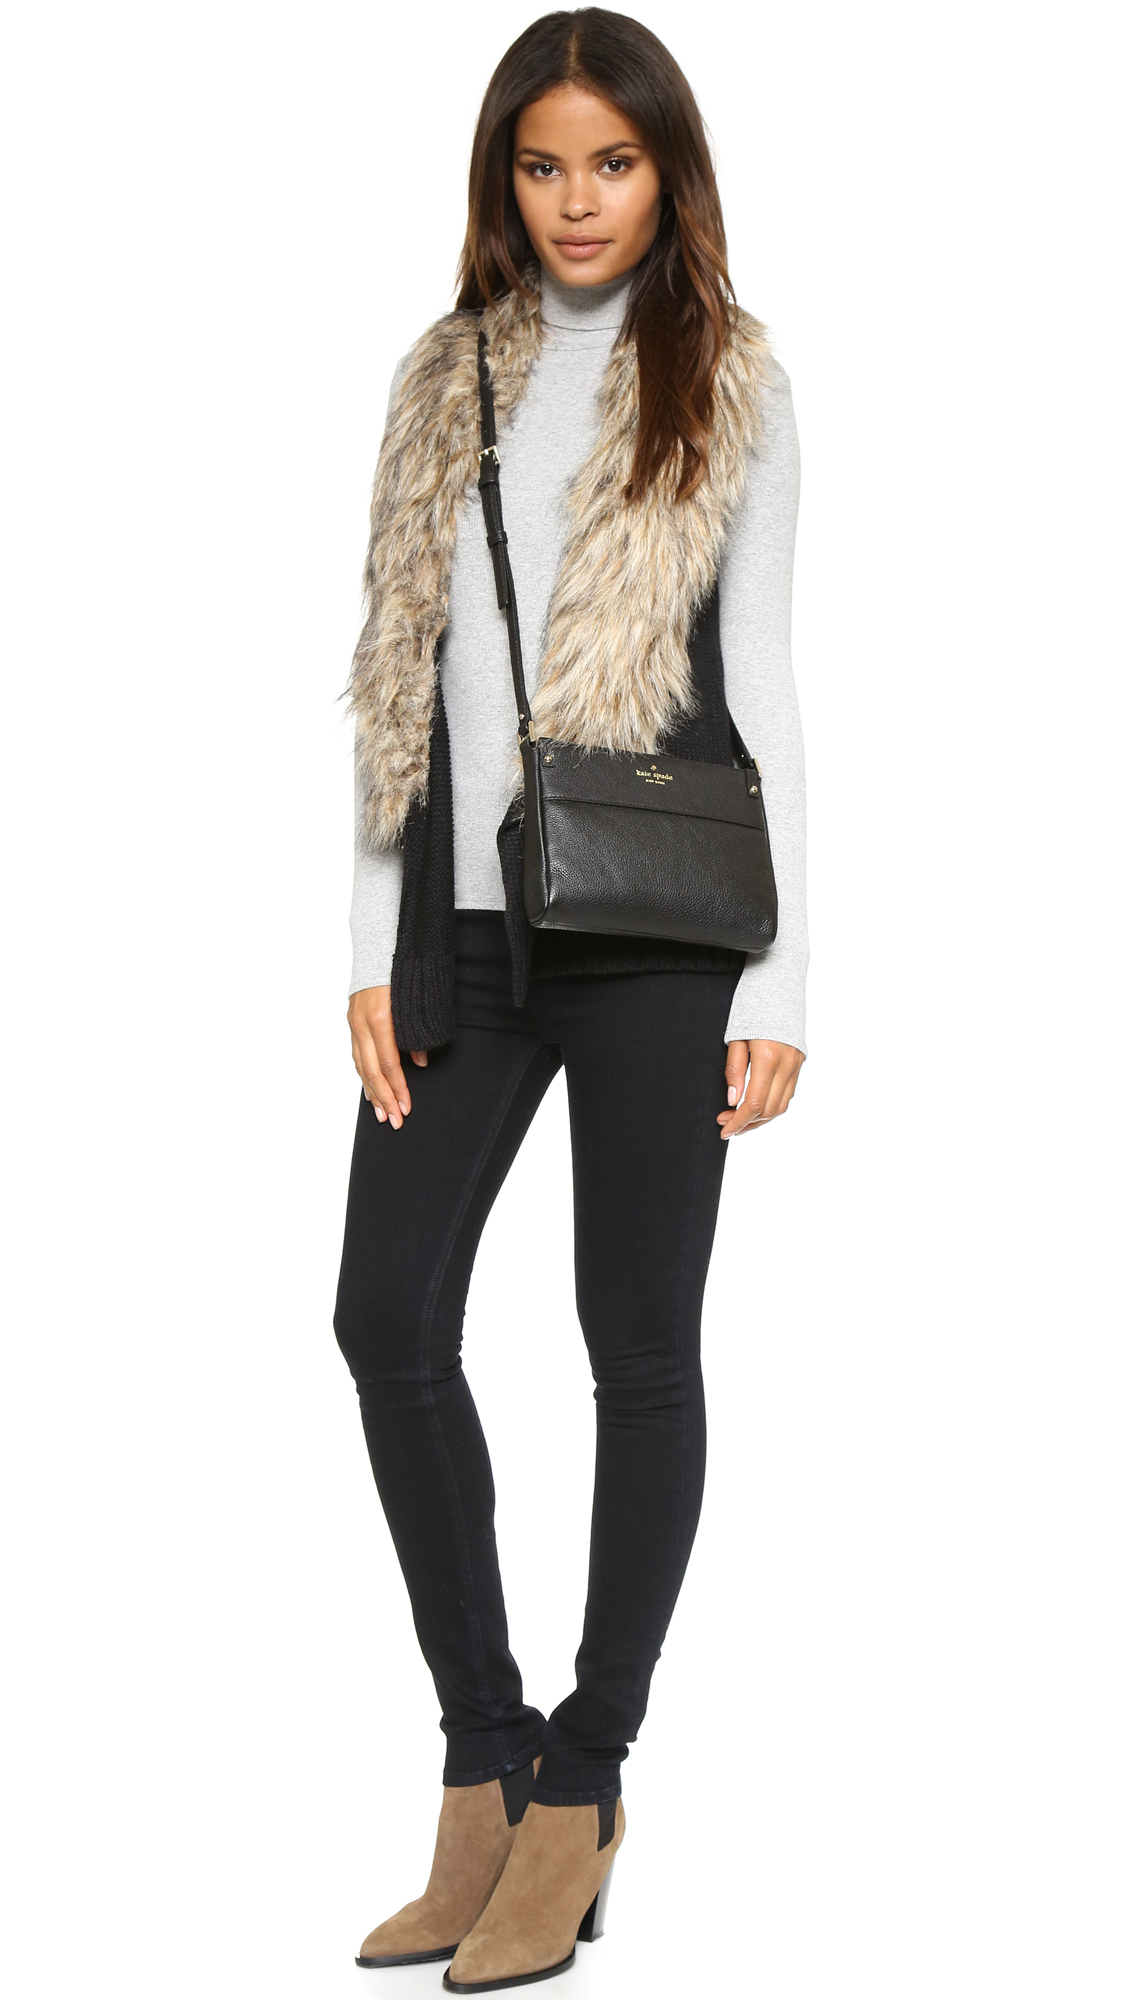 Kate Spade Leather Cooper Cross Body Bag - Black